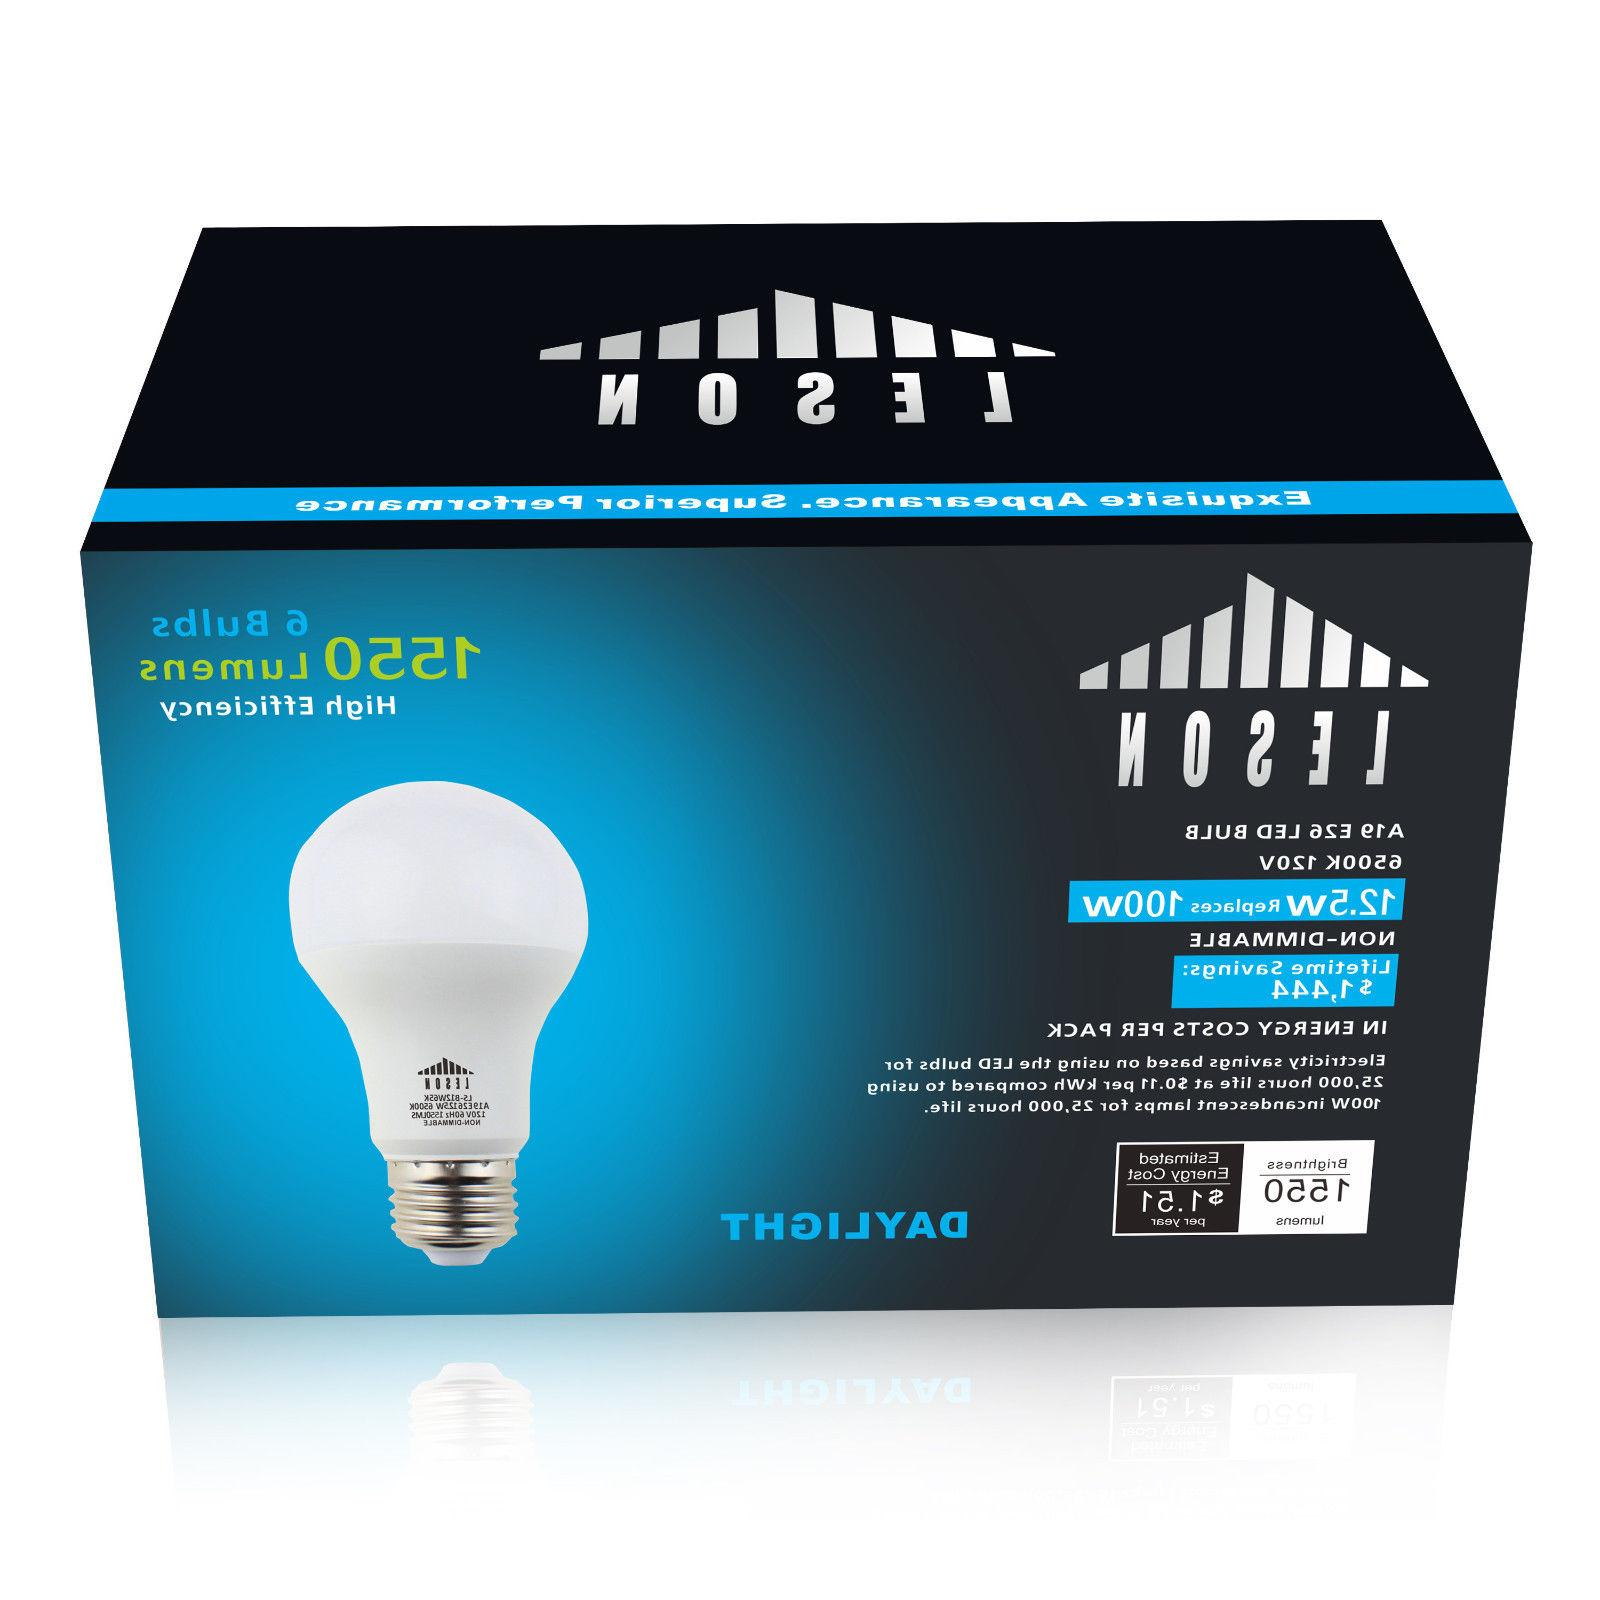 LED Watt E26 1550lm 13W Daylight